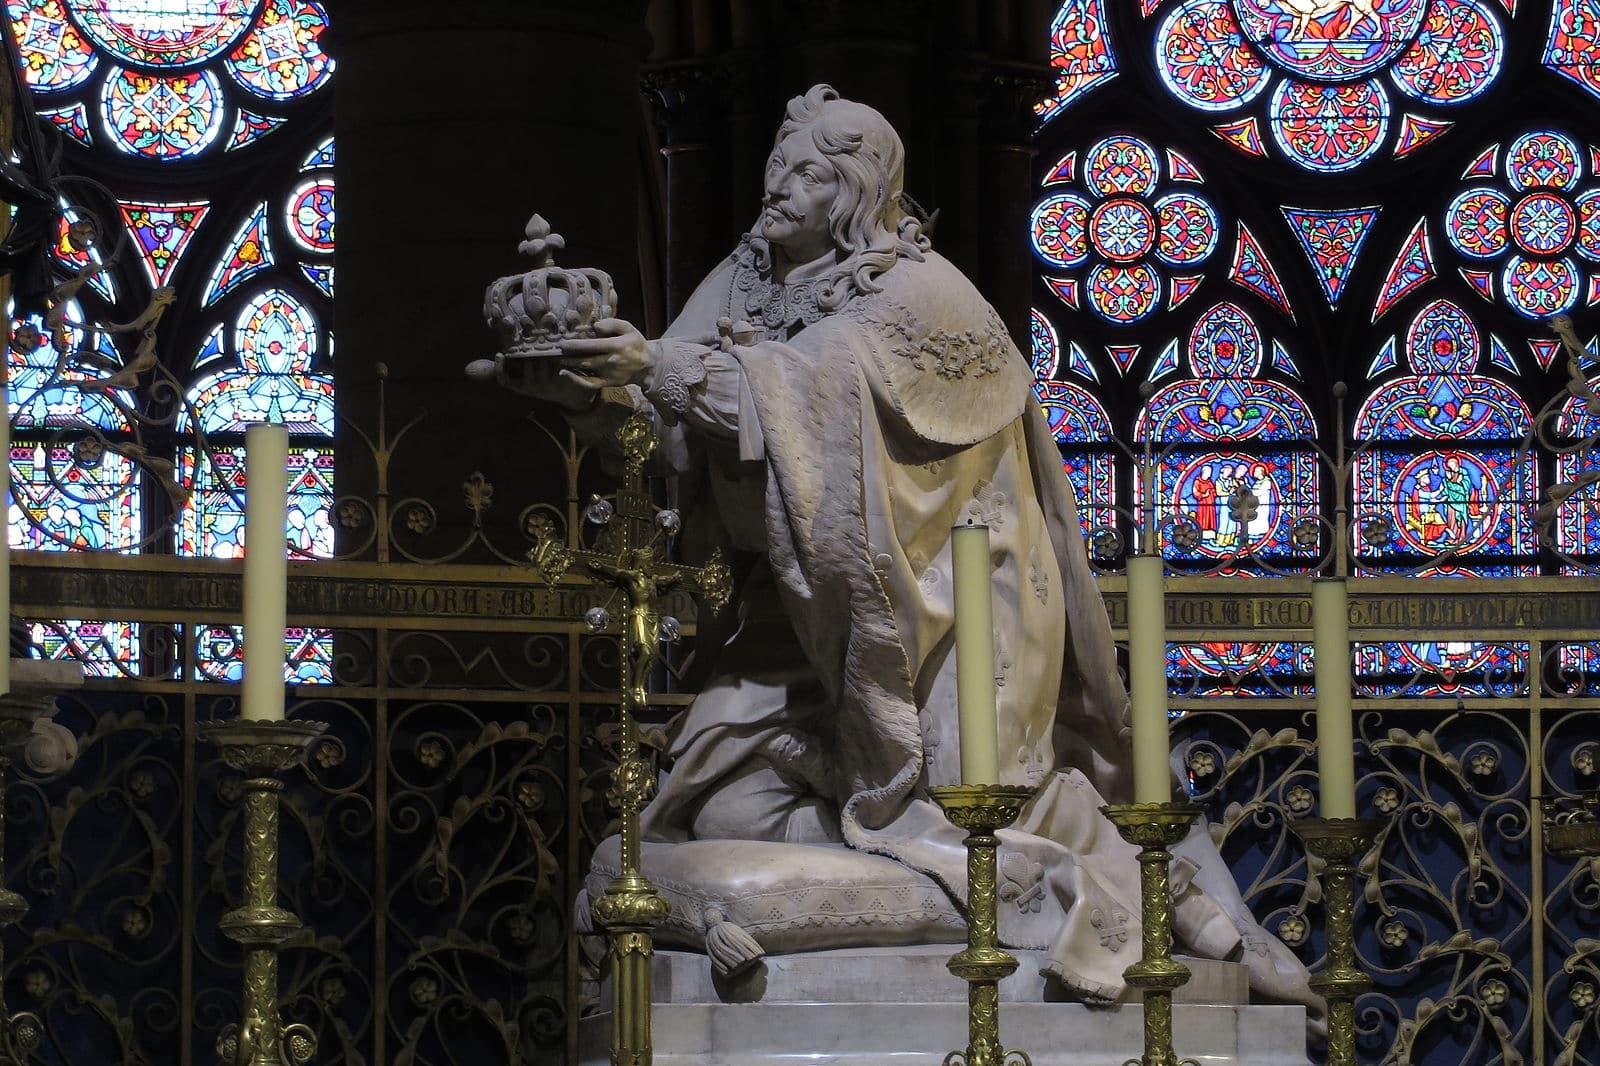 Louis XIII Notre Dame restauration